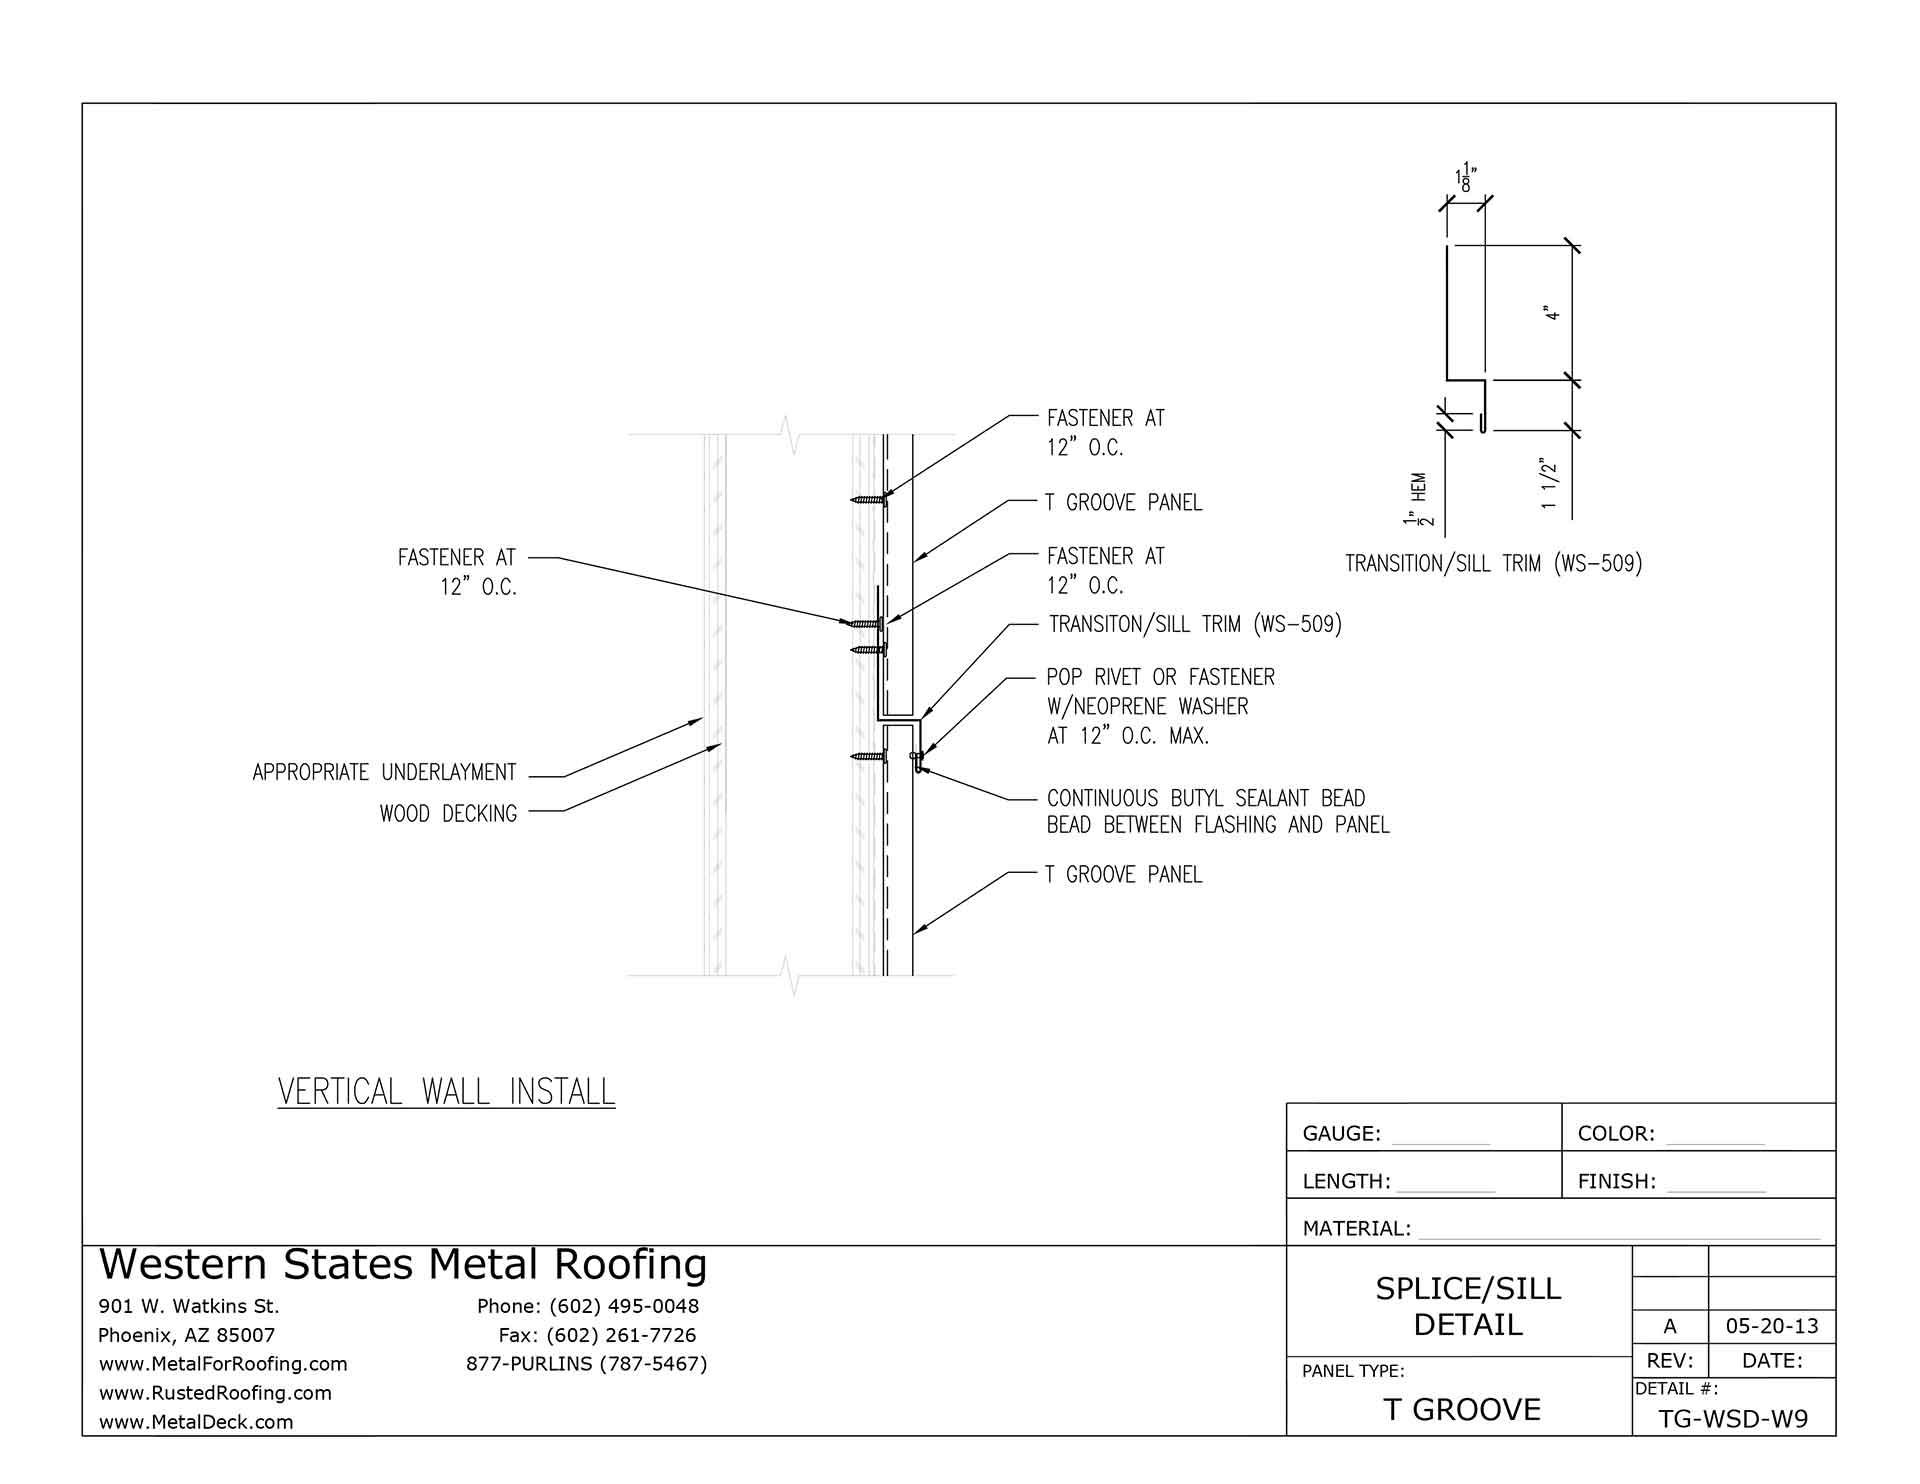 https://f.hubspotusercontent30.net/hubfs/6069238/images/trim-flashings/t-groove/tg-wsd-w9-splice-sill-detail.jpg